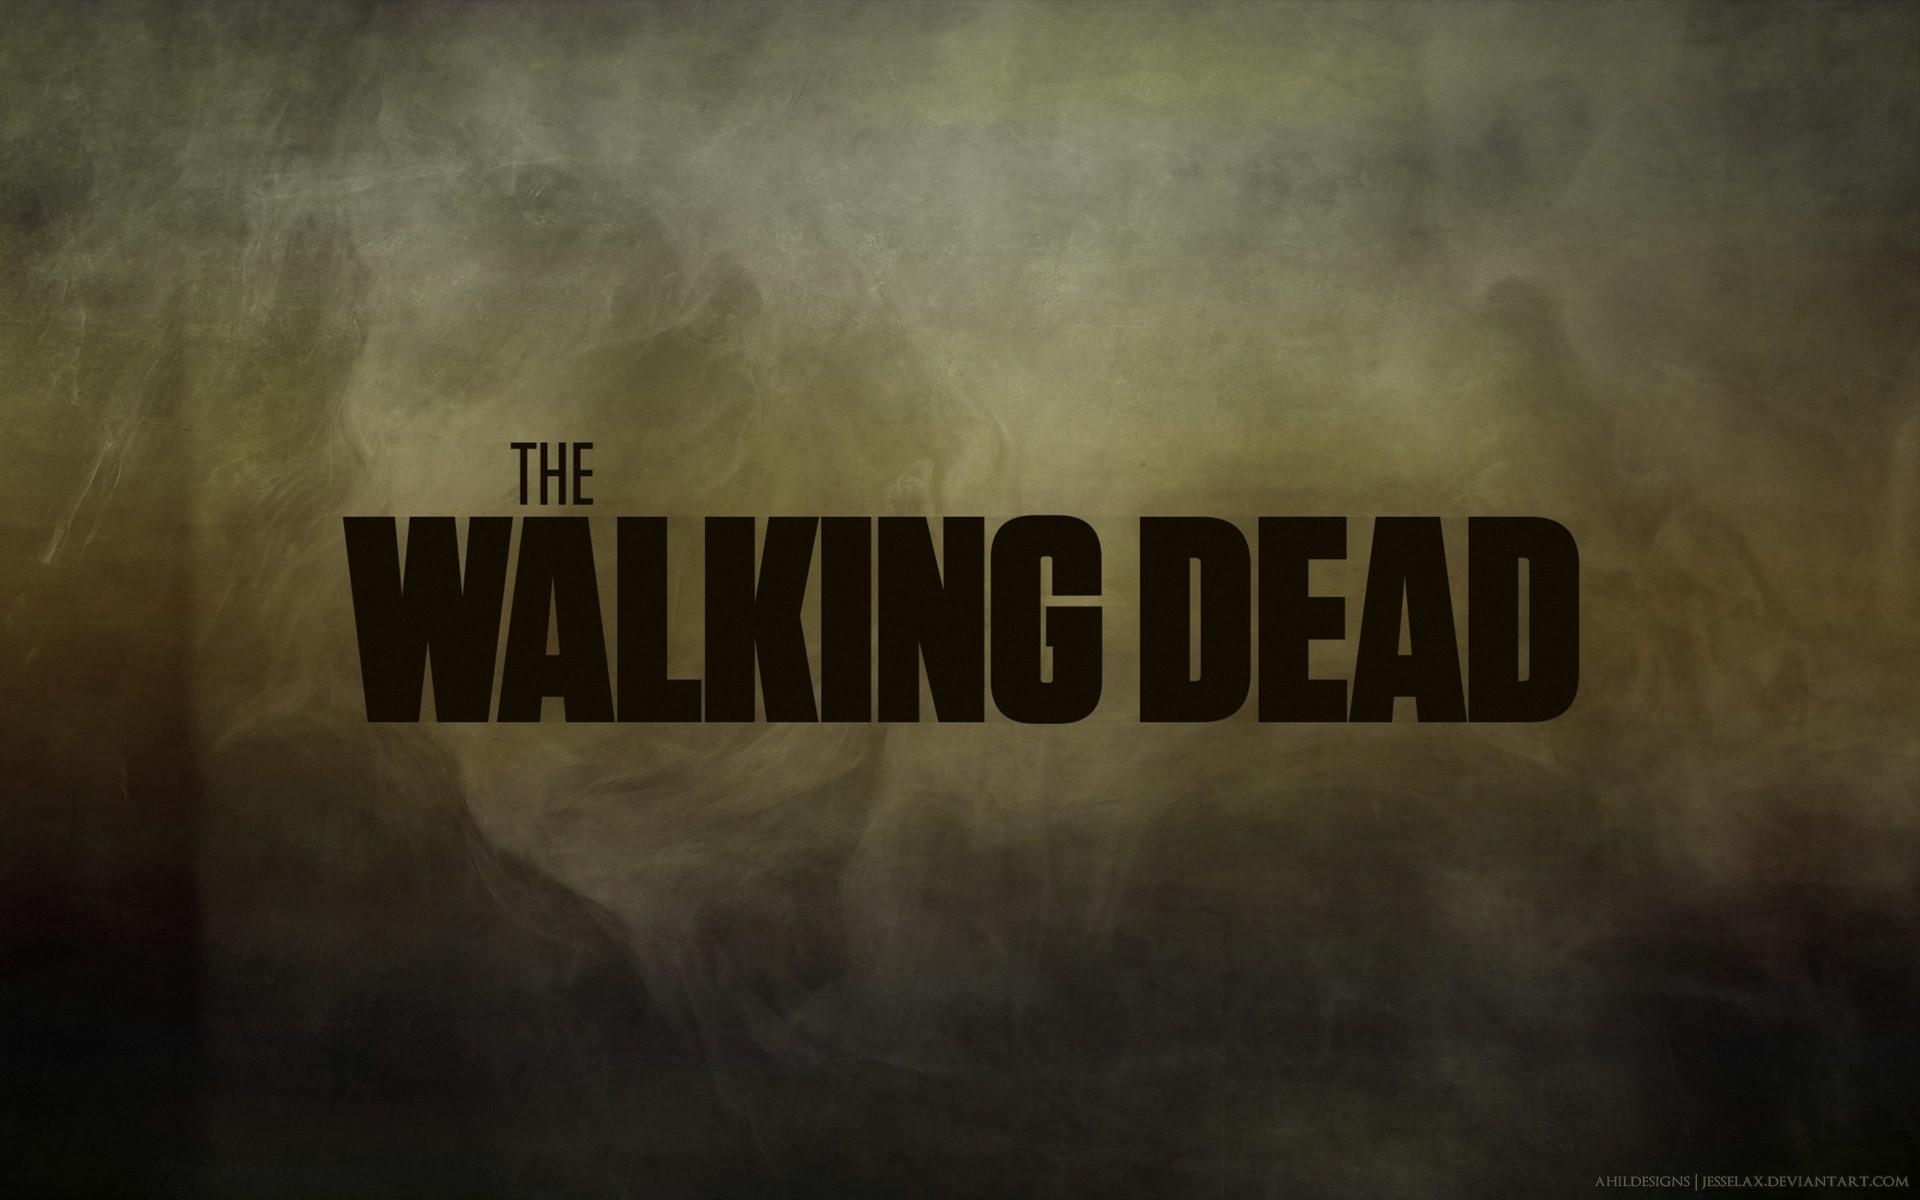 The Walking Dead Poster Art Hd Wallpaper   Wallpaper List